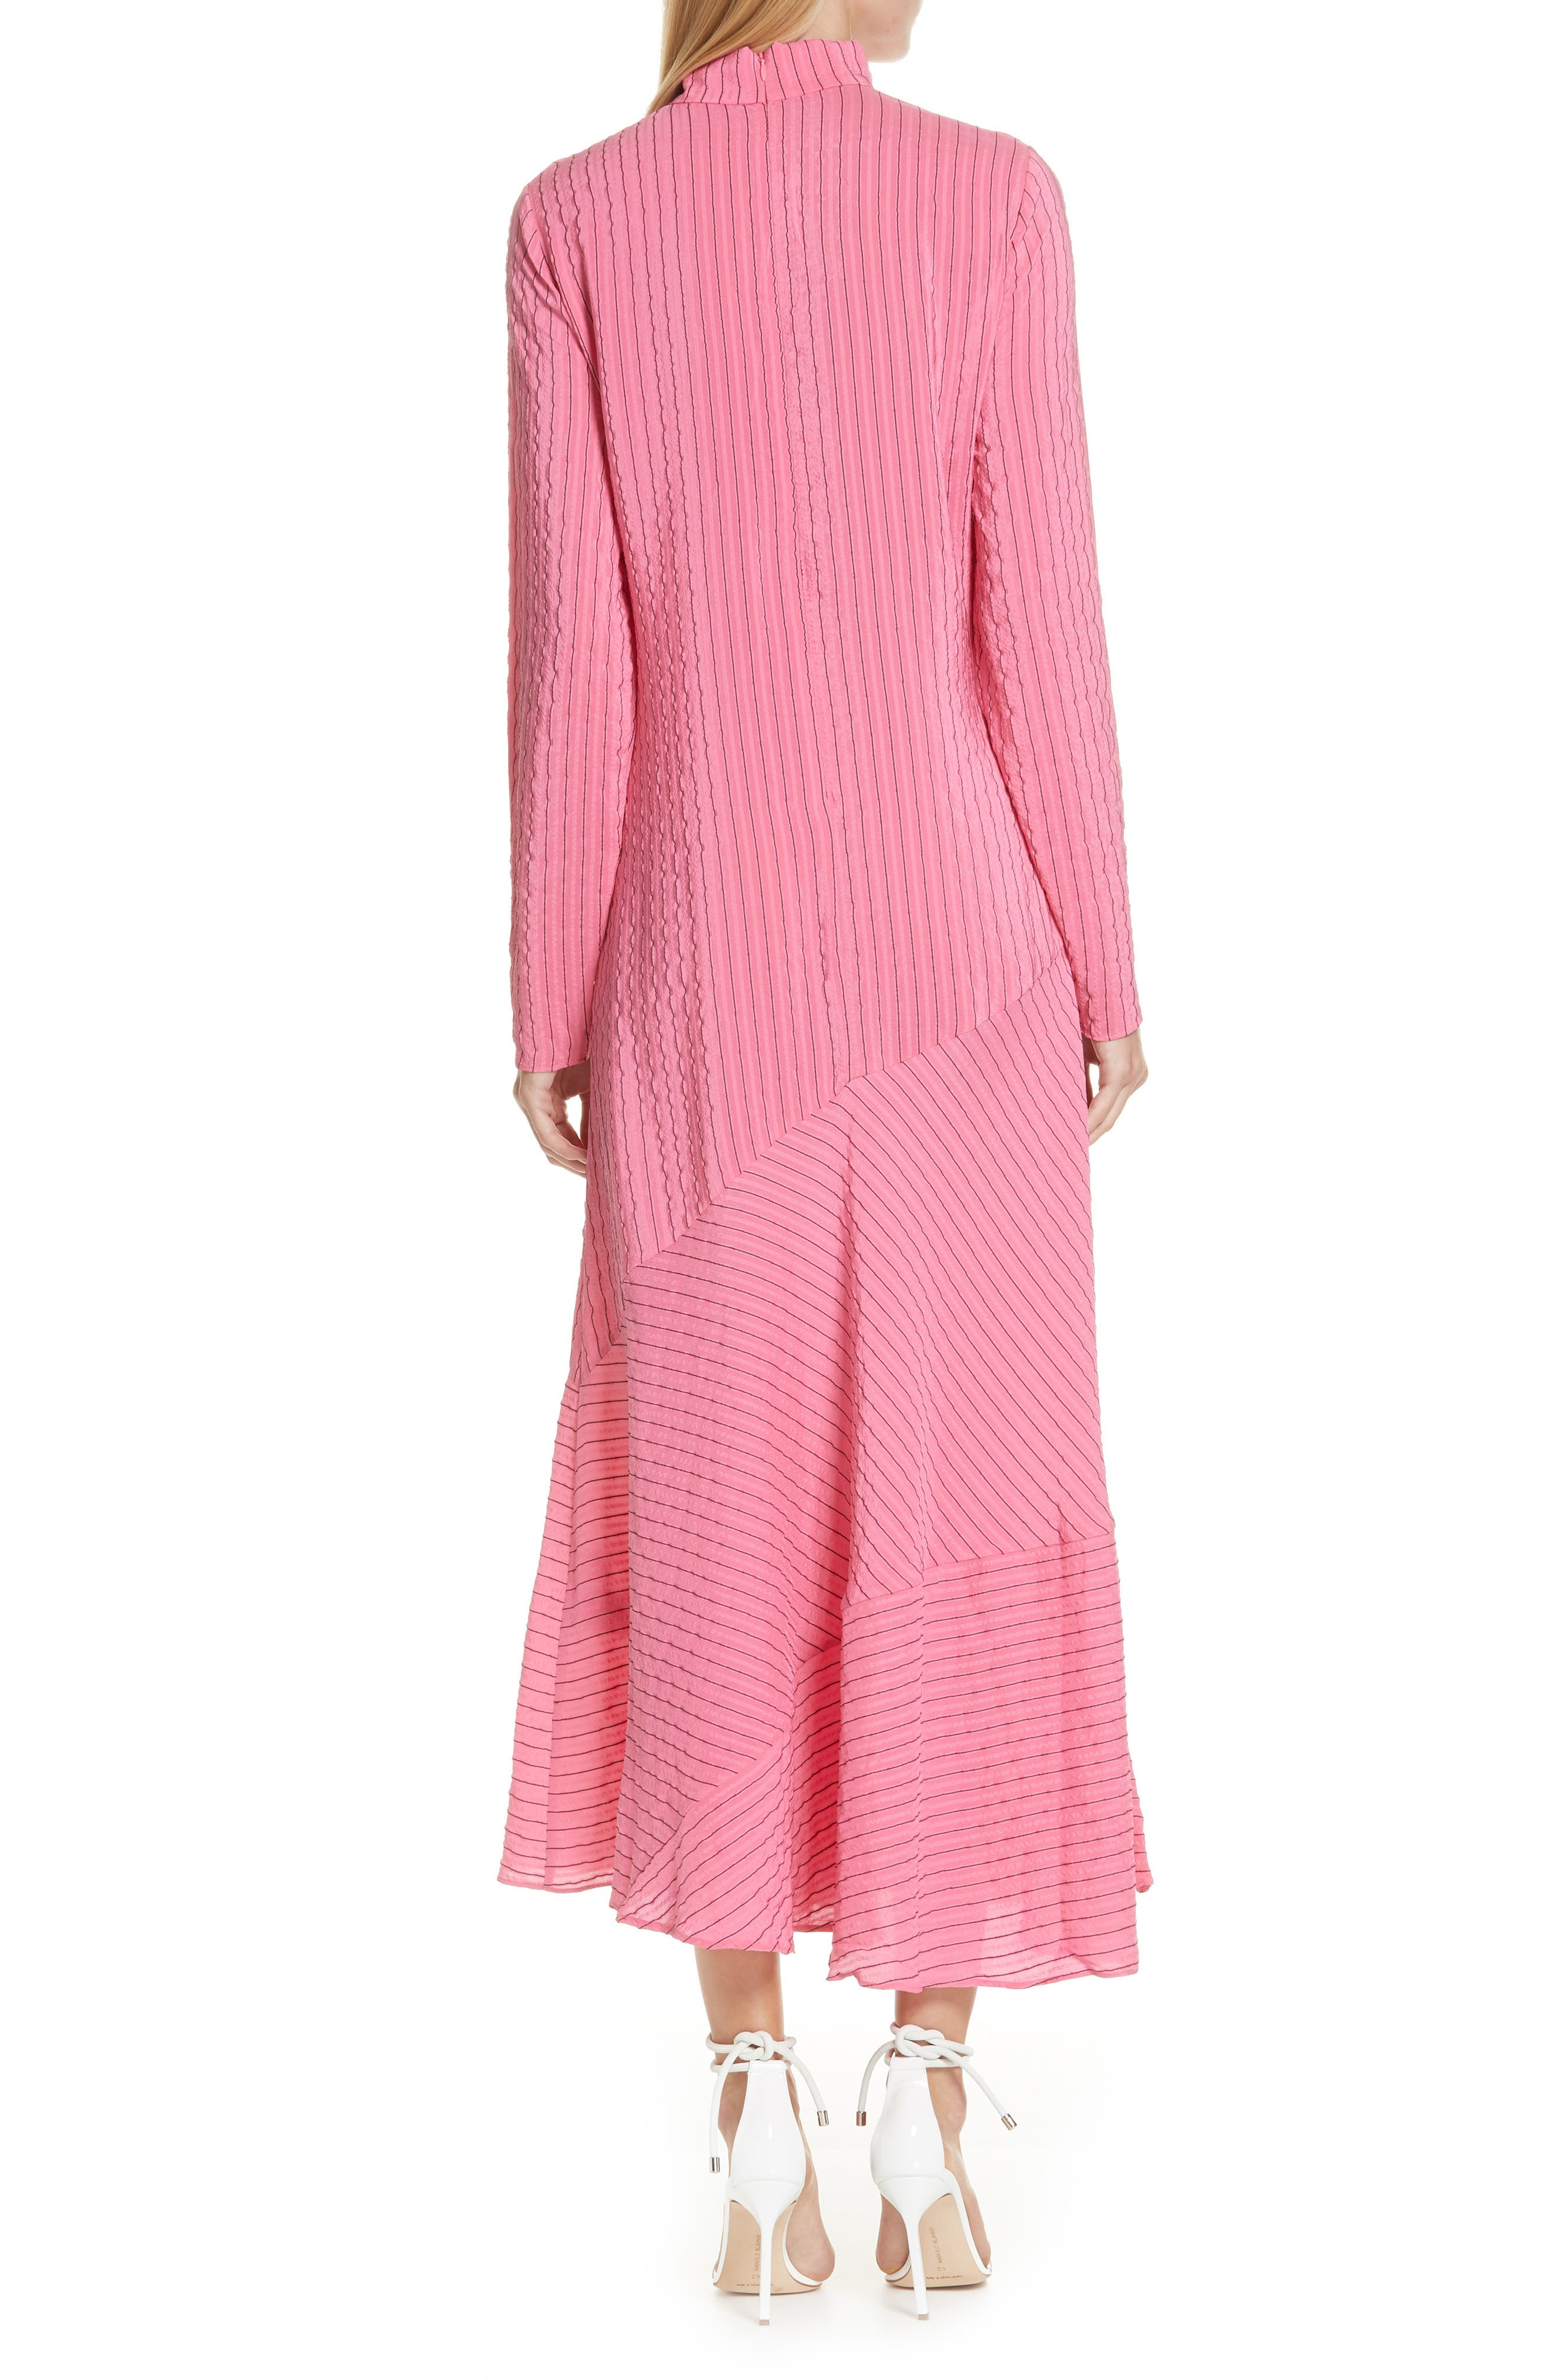 Seersucker Silk Blend Dress,                             Alternate thumbnail 2, color,                             650